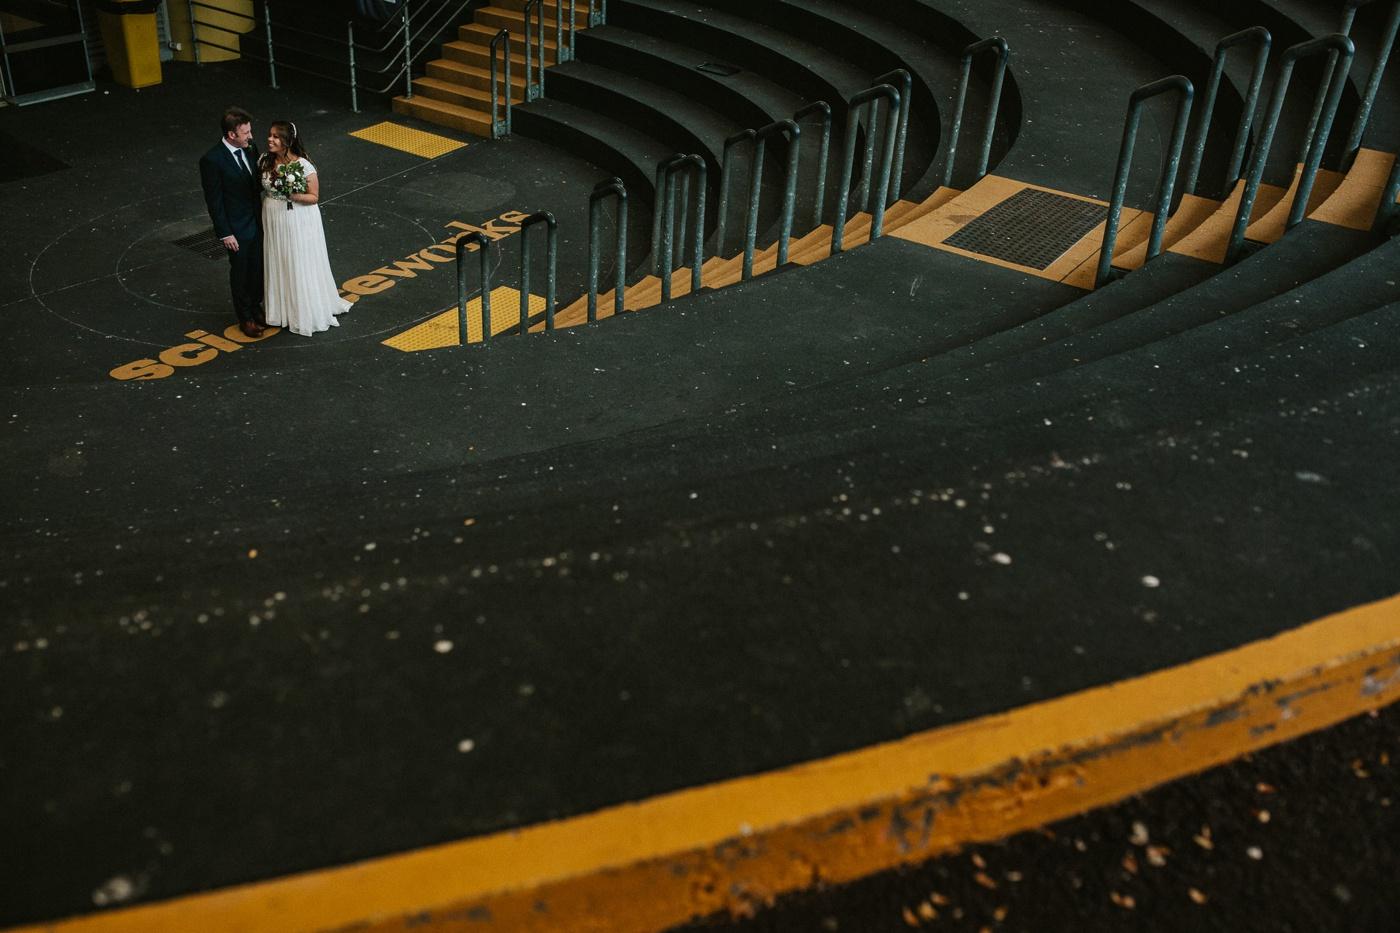 anitadaniel_melbourne-scienceworks-relaxed-fun-geek-wedding_melbourne-candid-wedding-photography_25